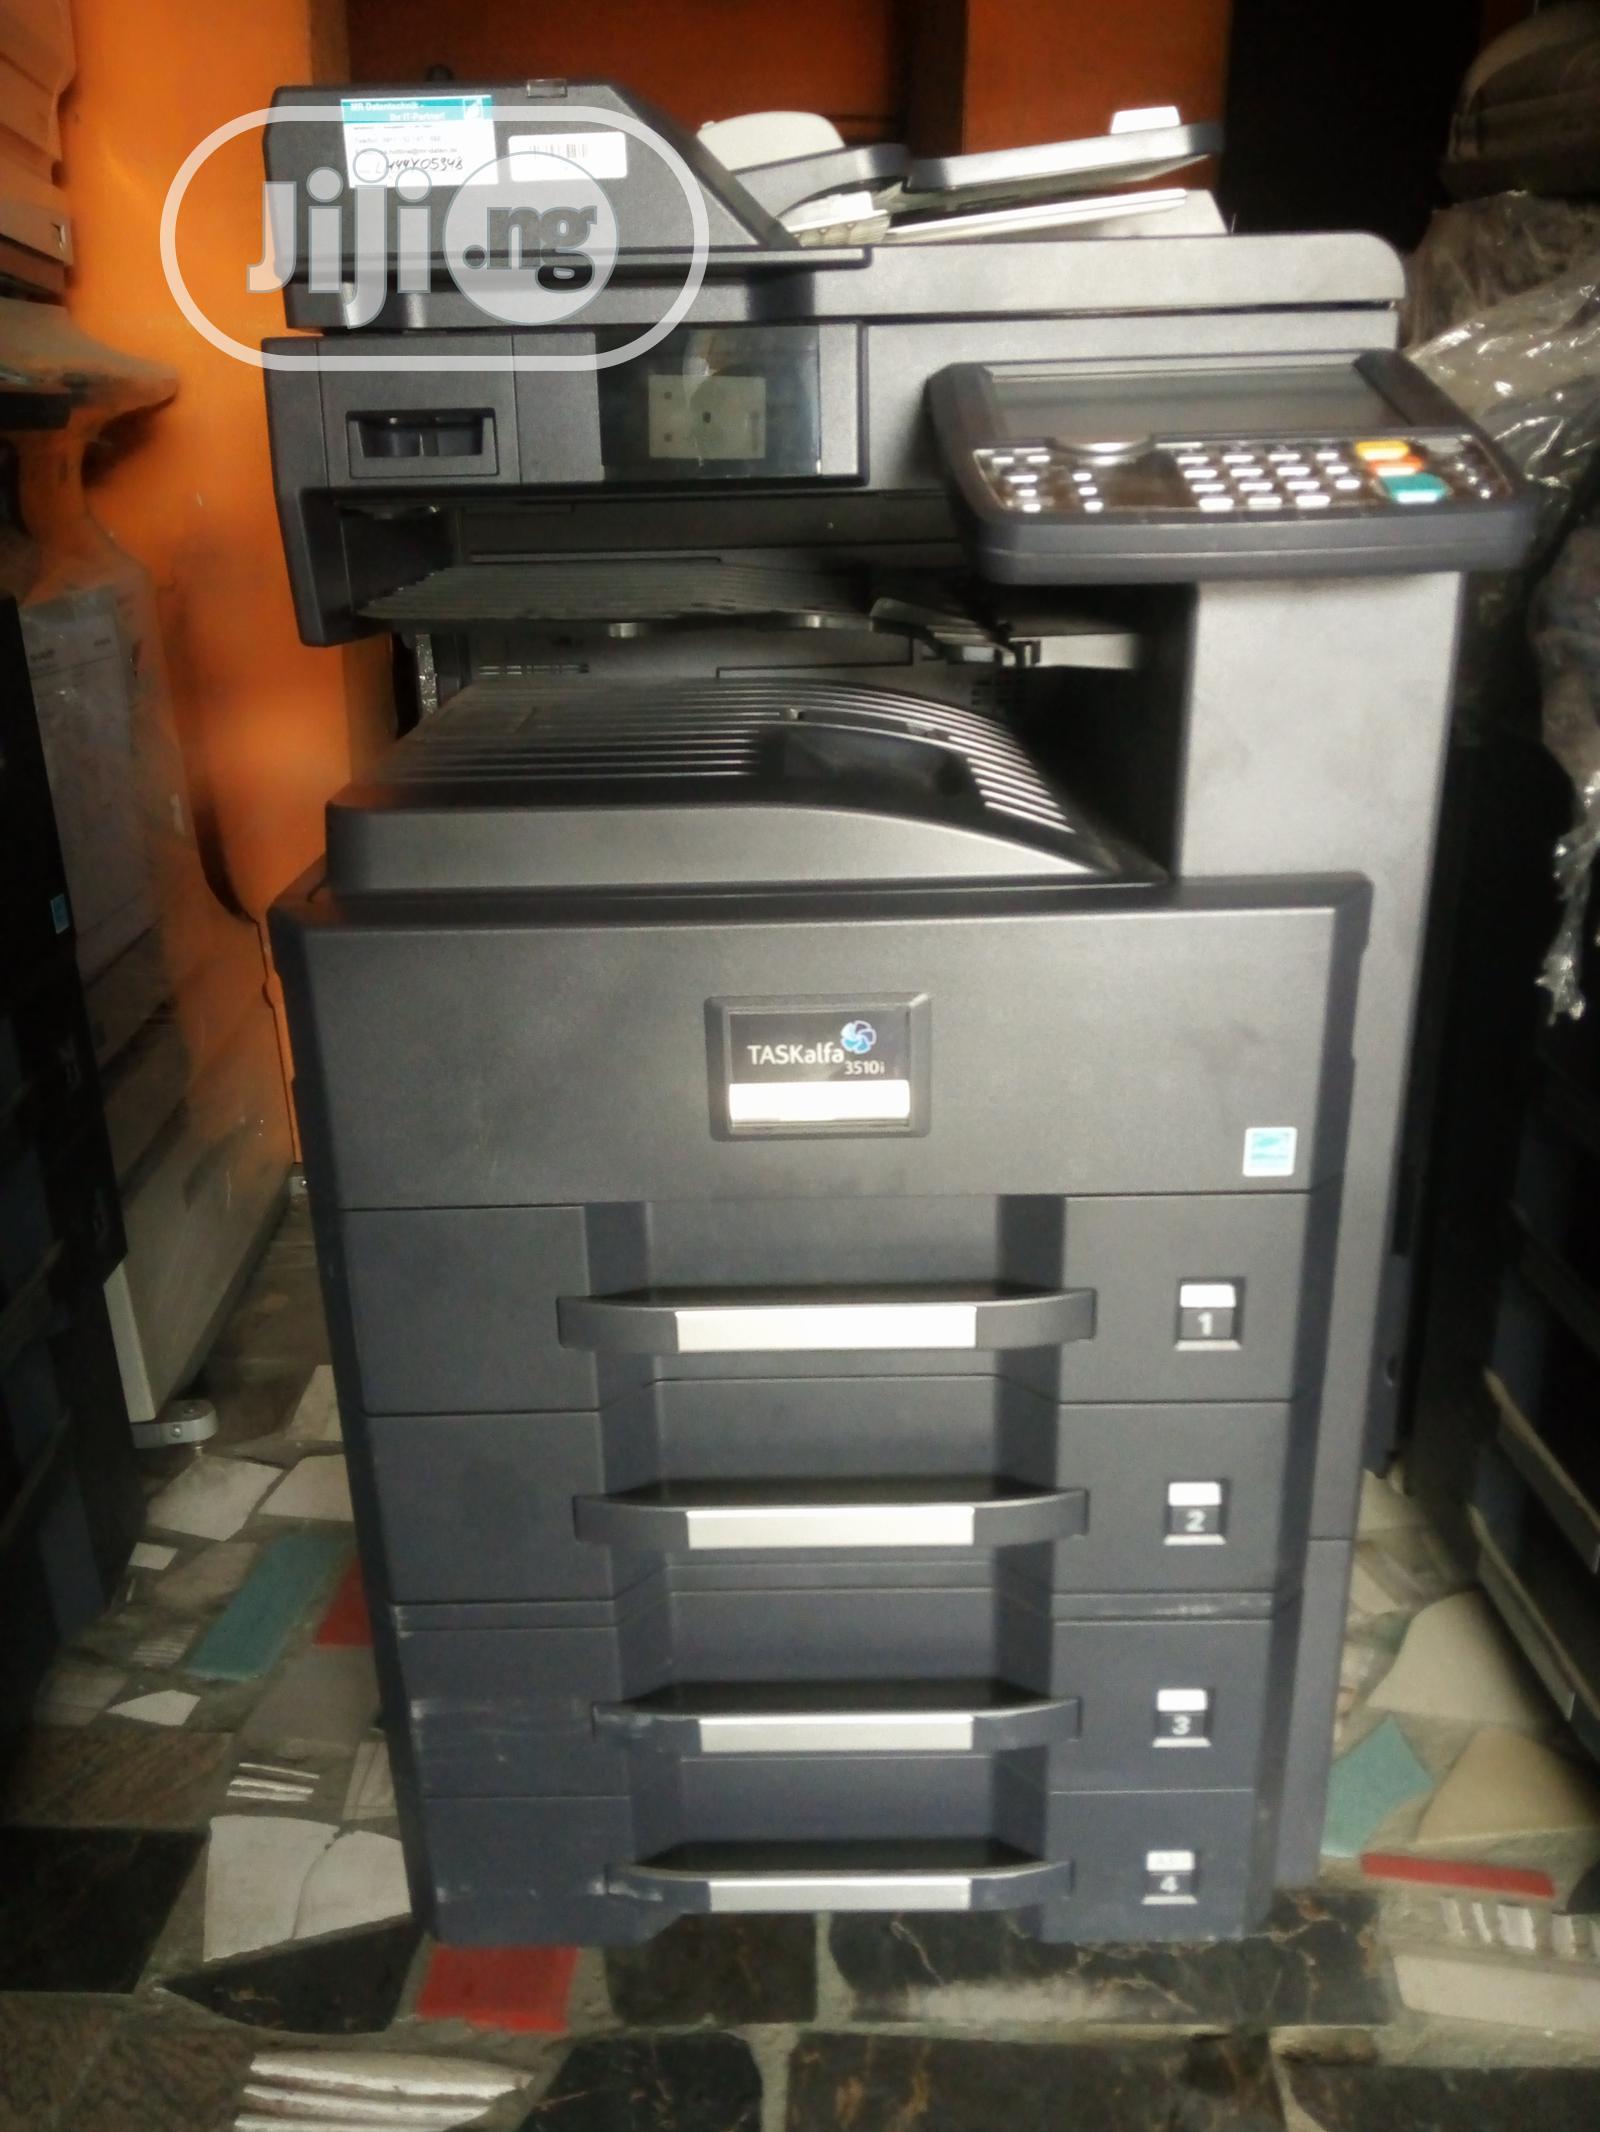 Taskalfa Kyocera 3510i Multifunctional Black And White | Printers & Scanners for sale in Surulere, Lagos State, Nigeria